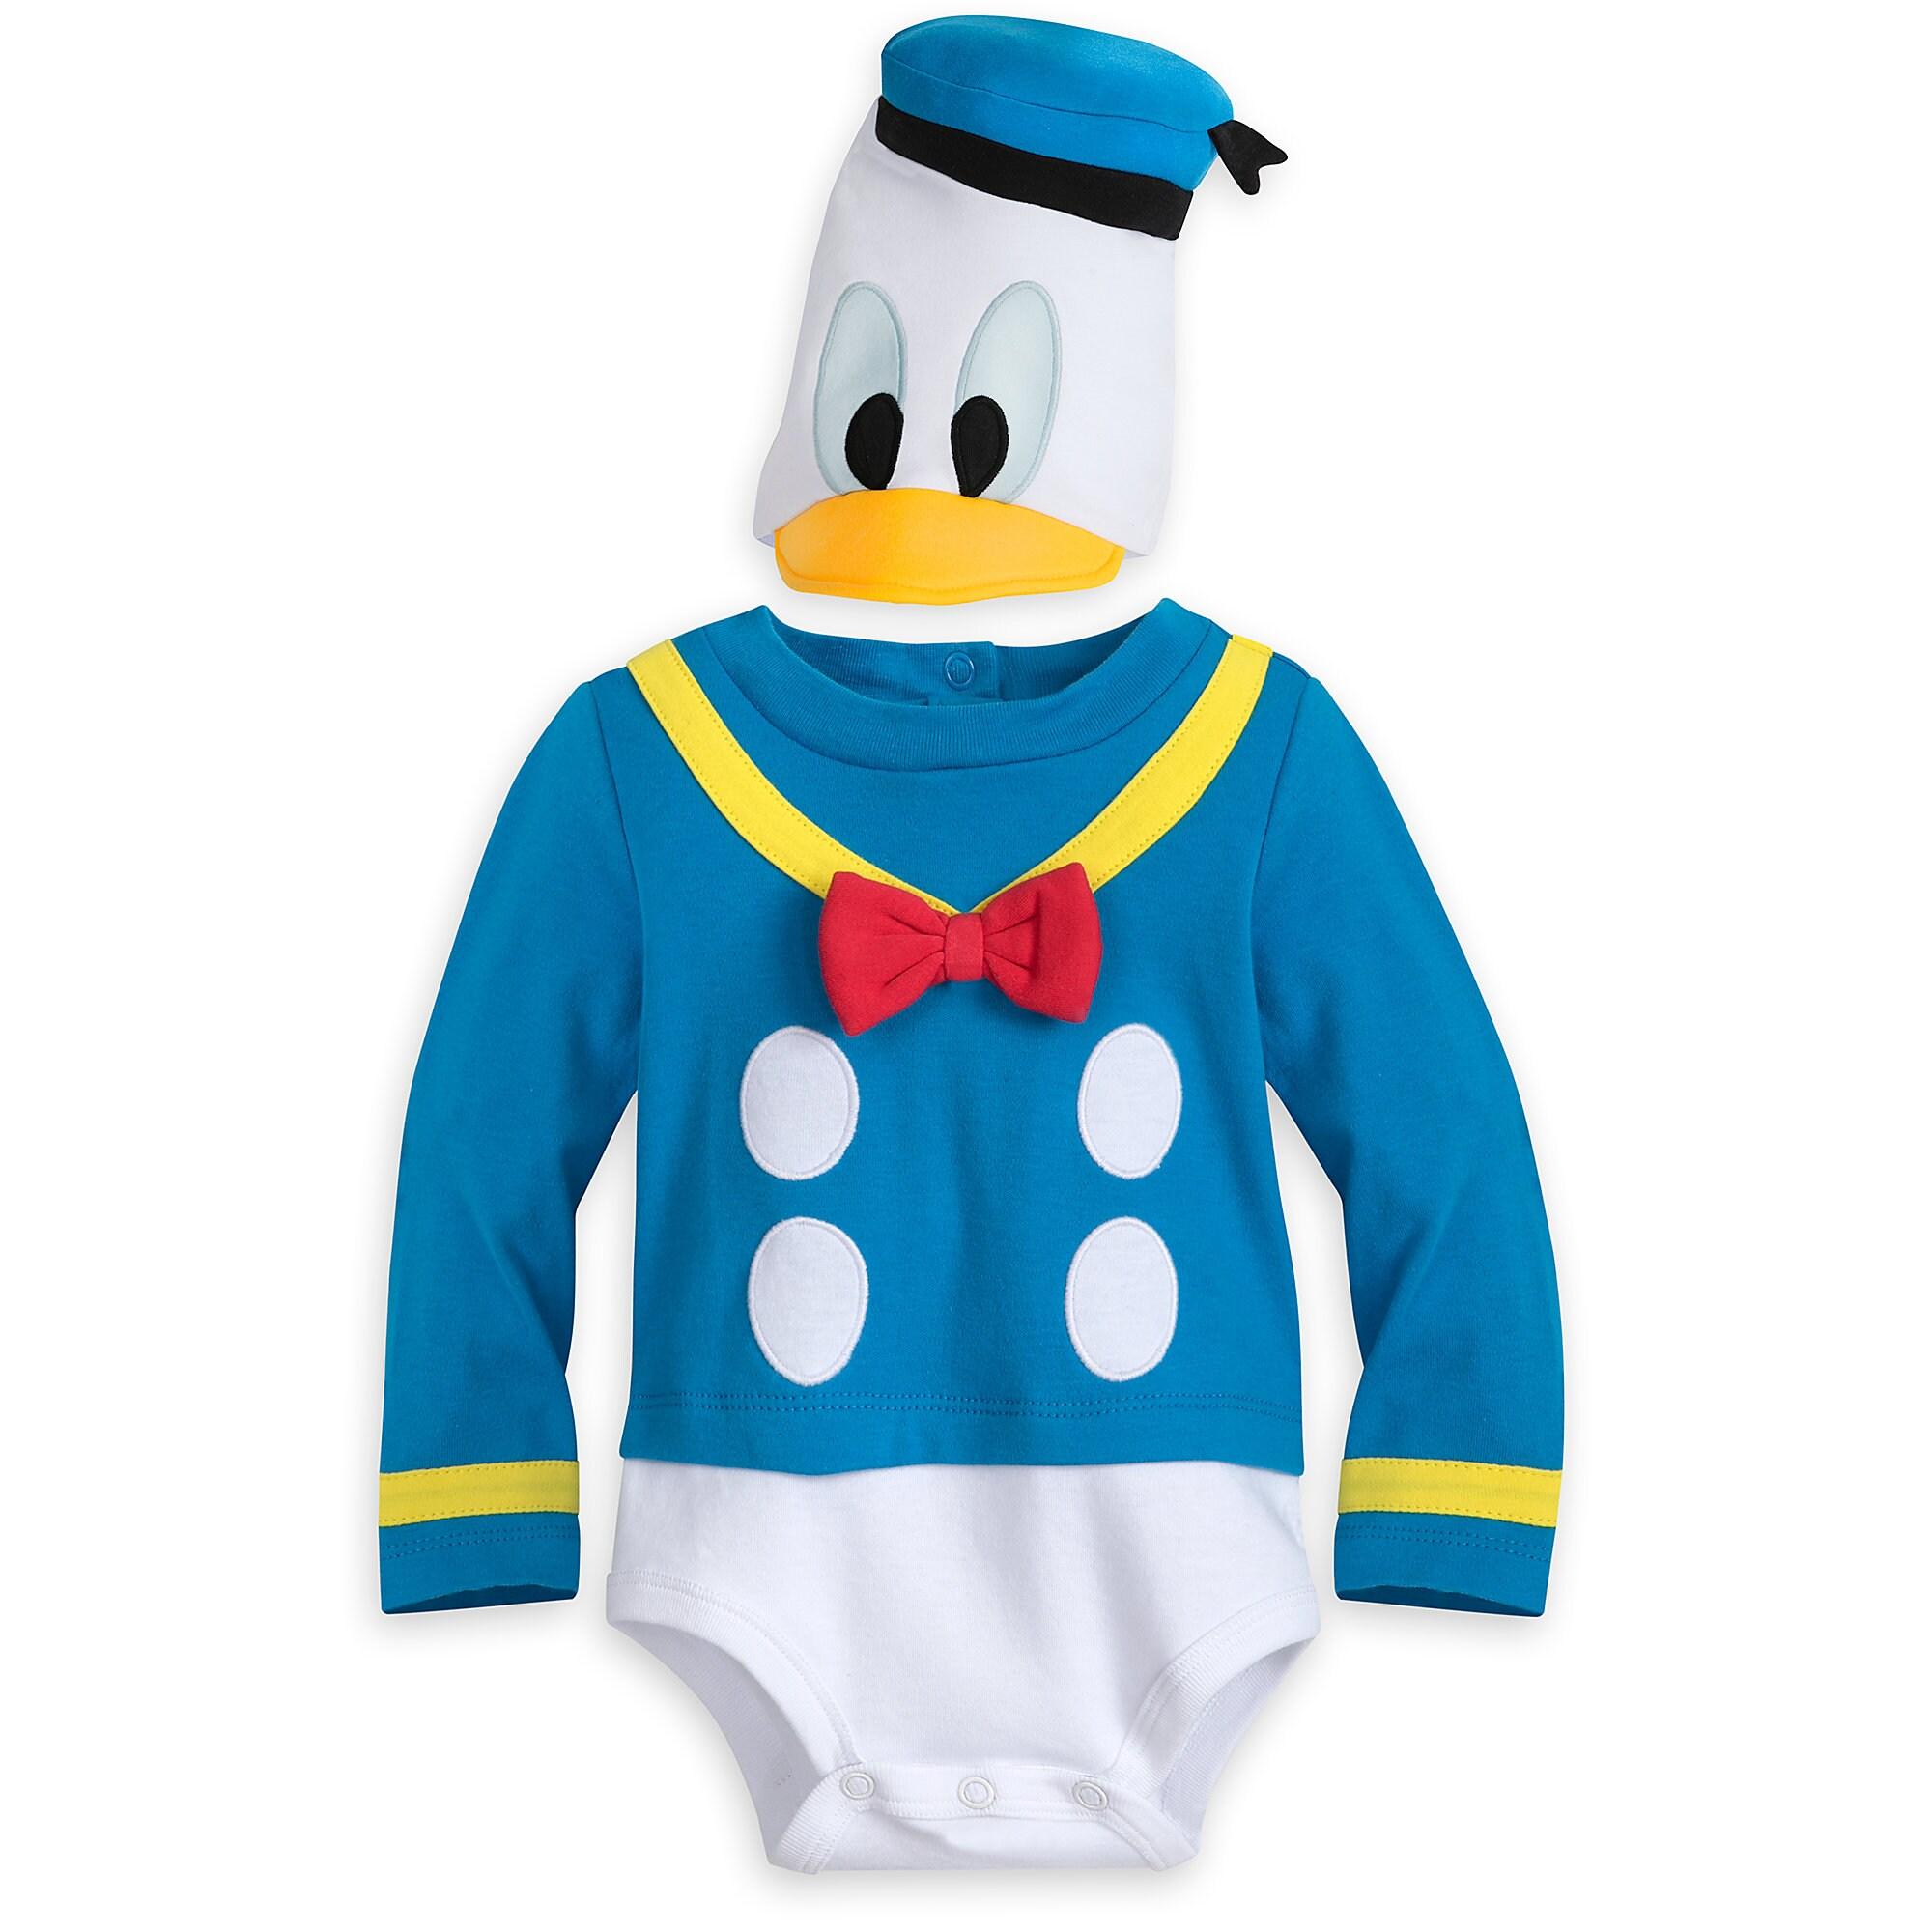 Donald Duck Costume Bodysuit for Baby